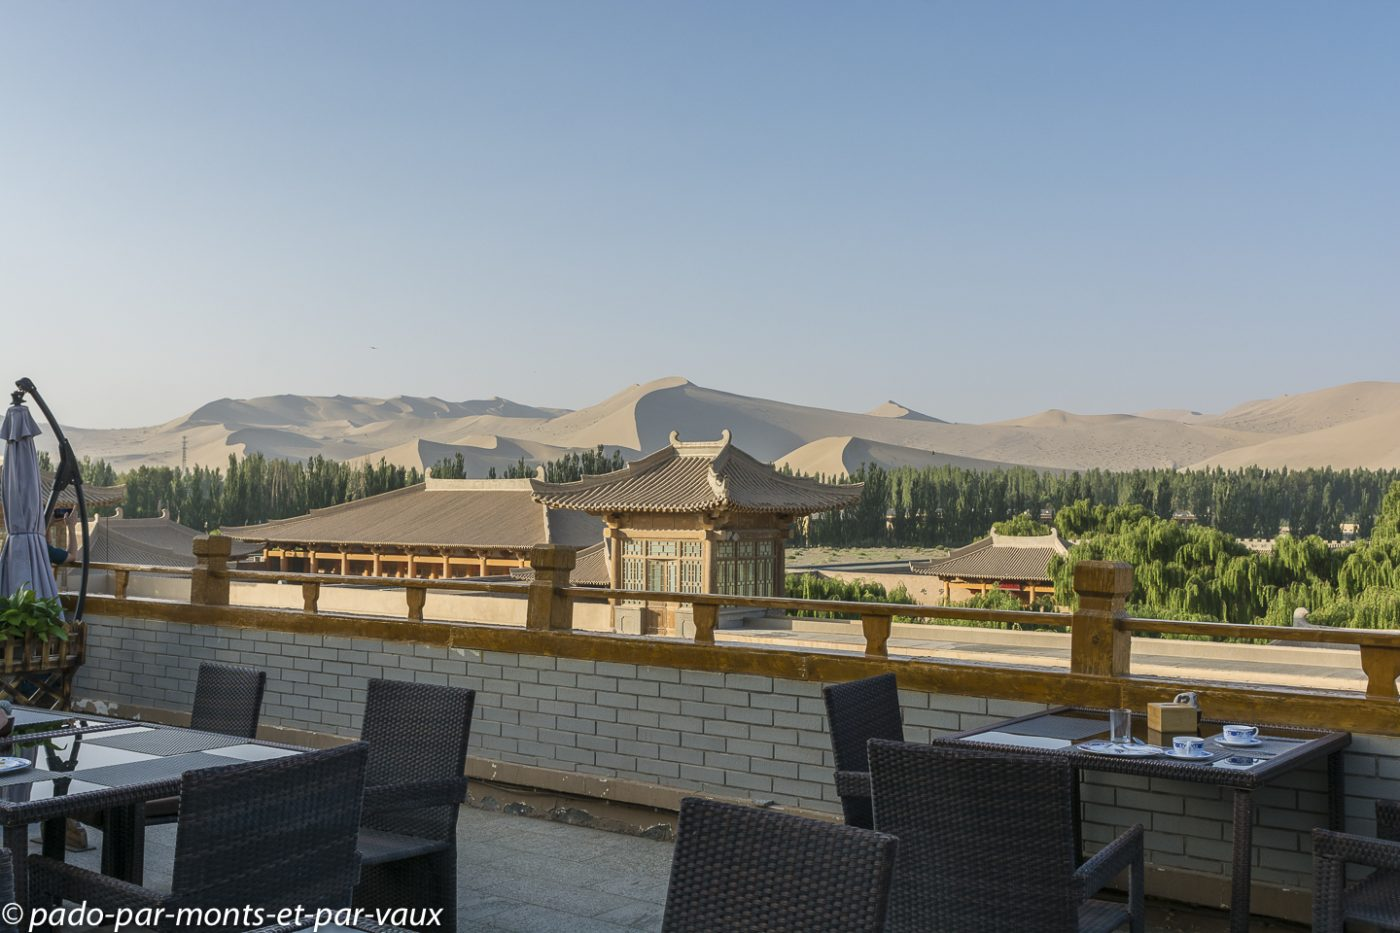 Dunhuang - terrasse de l'hôtel Silk Roads